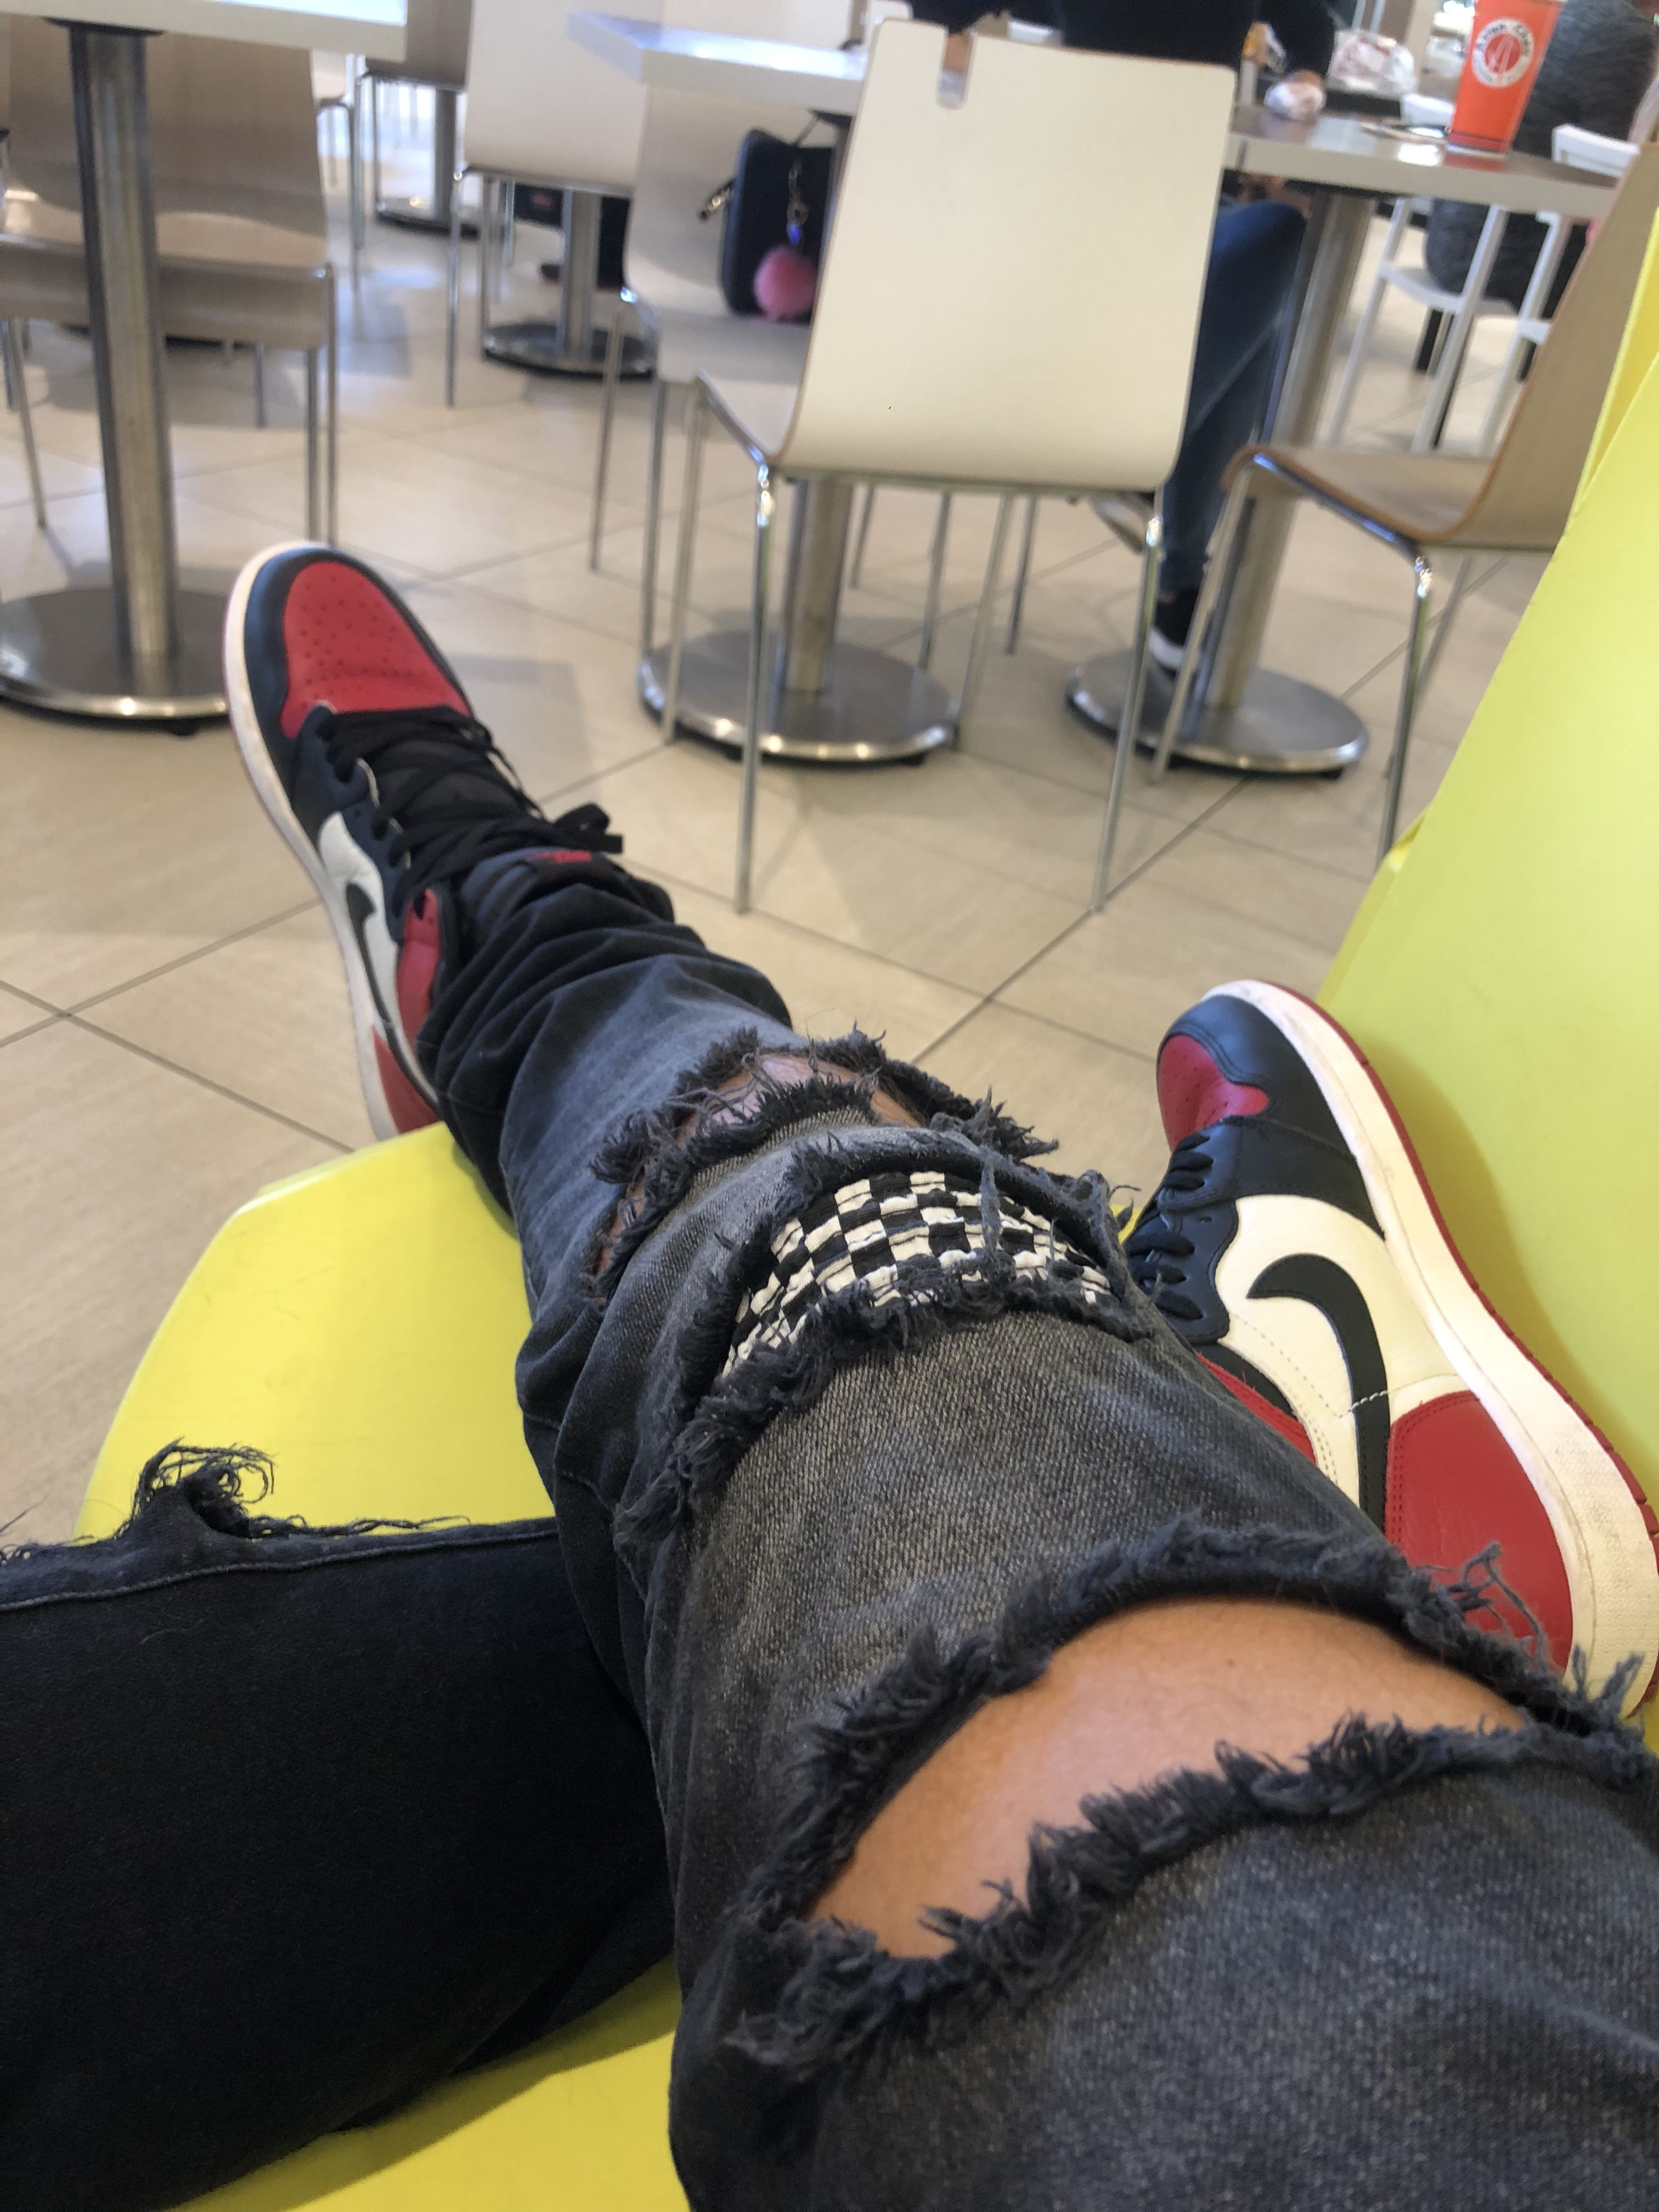 5540d75b2fa1  bred  toes  toe  1s  retro  jordan  distorted  jeans  black  checkered   outfit  zara  sneakers  sneakerhead  swoosh